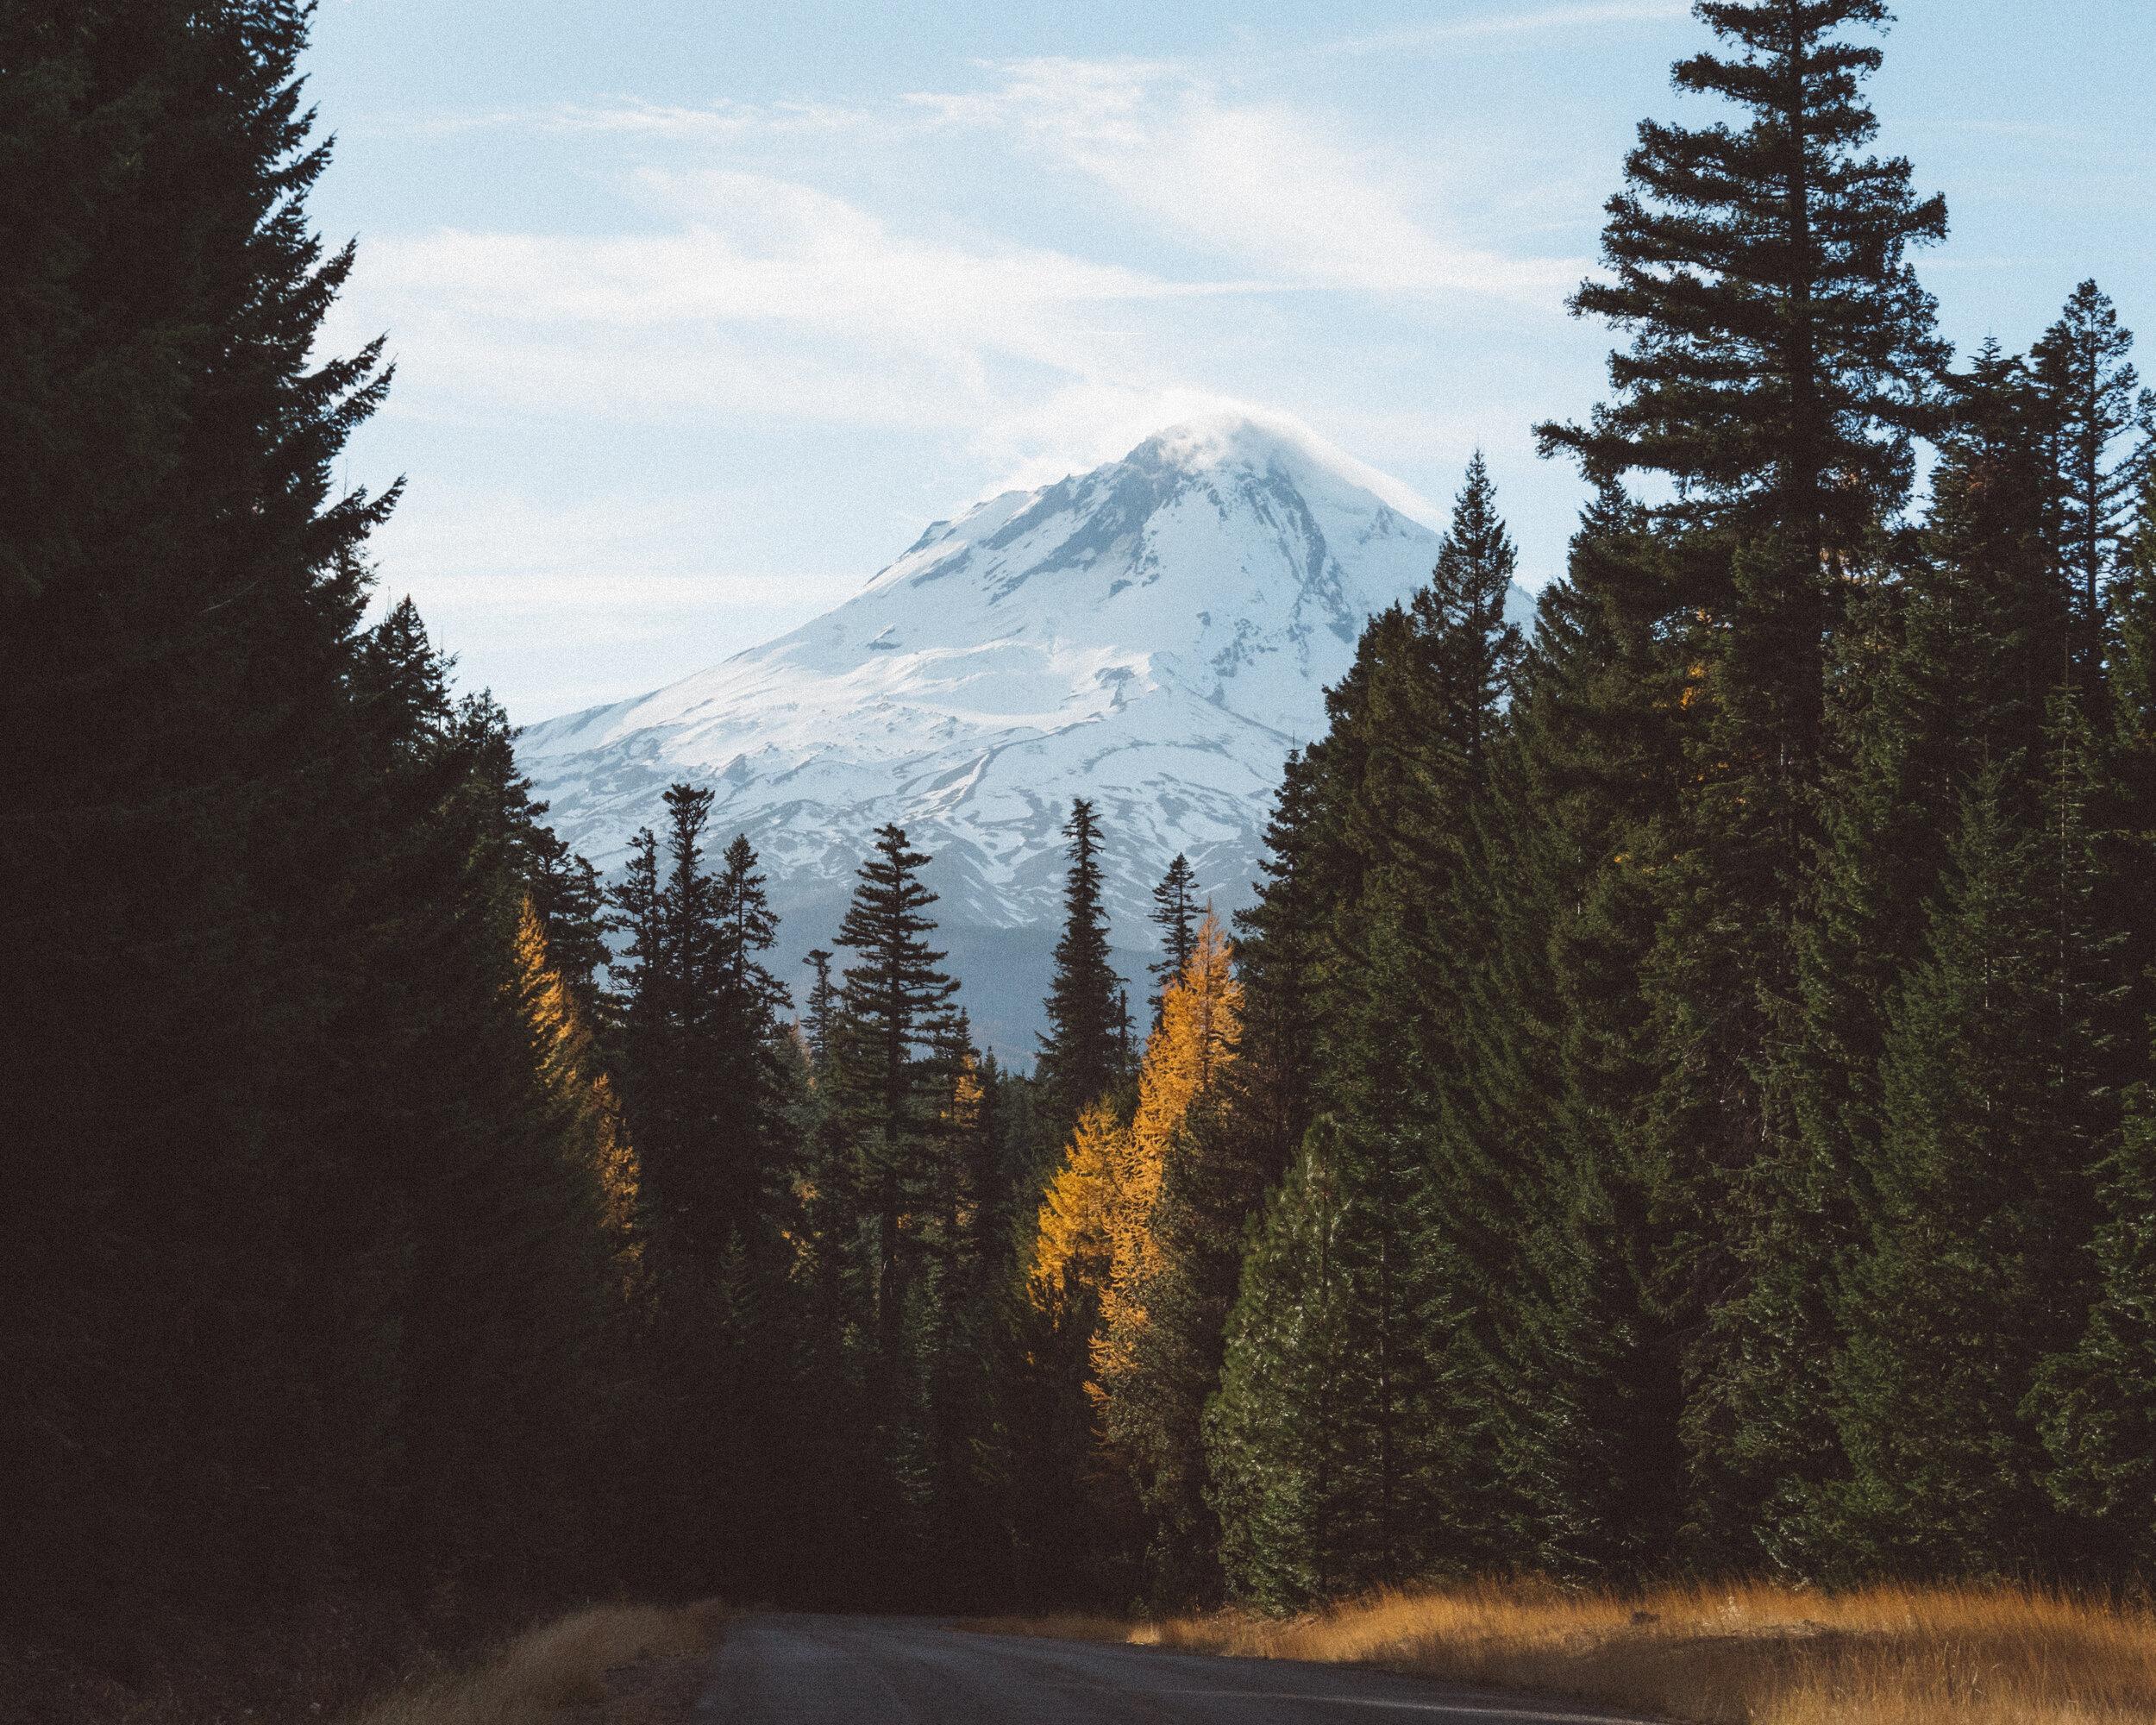 Pacific Northwest Seminars - Will Vision & Laser Centers